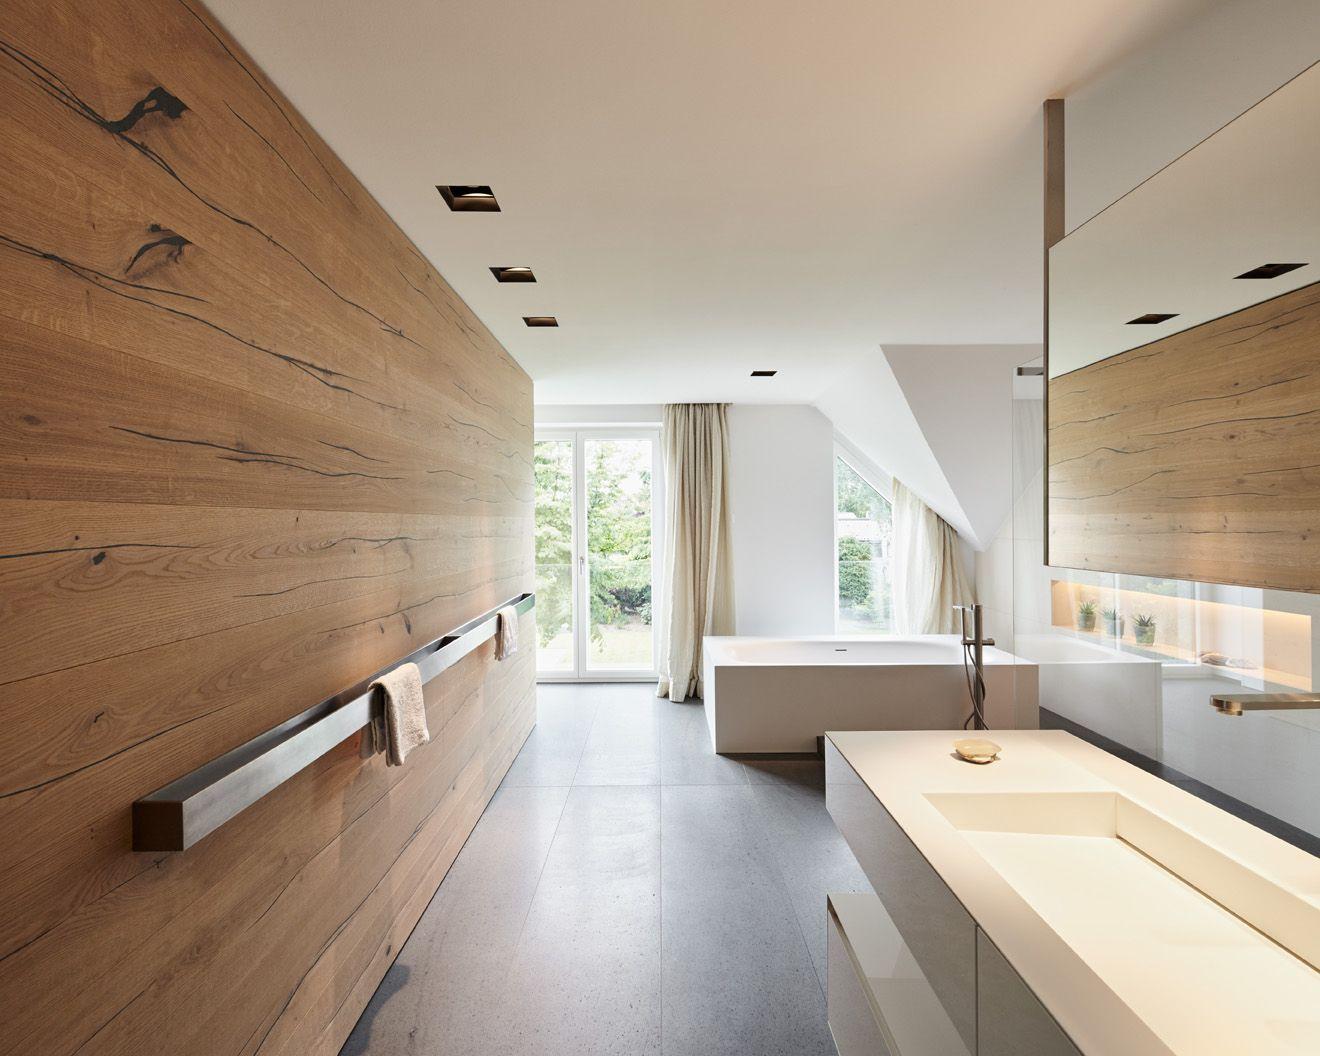 Badezimmer Holz ~ Wellness oase badezimmer toilette holz waschbecken exklusiv